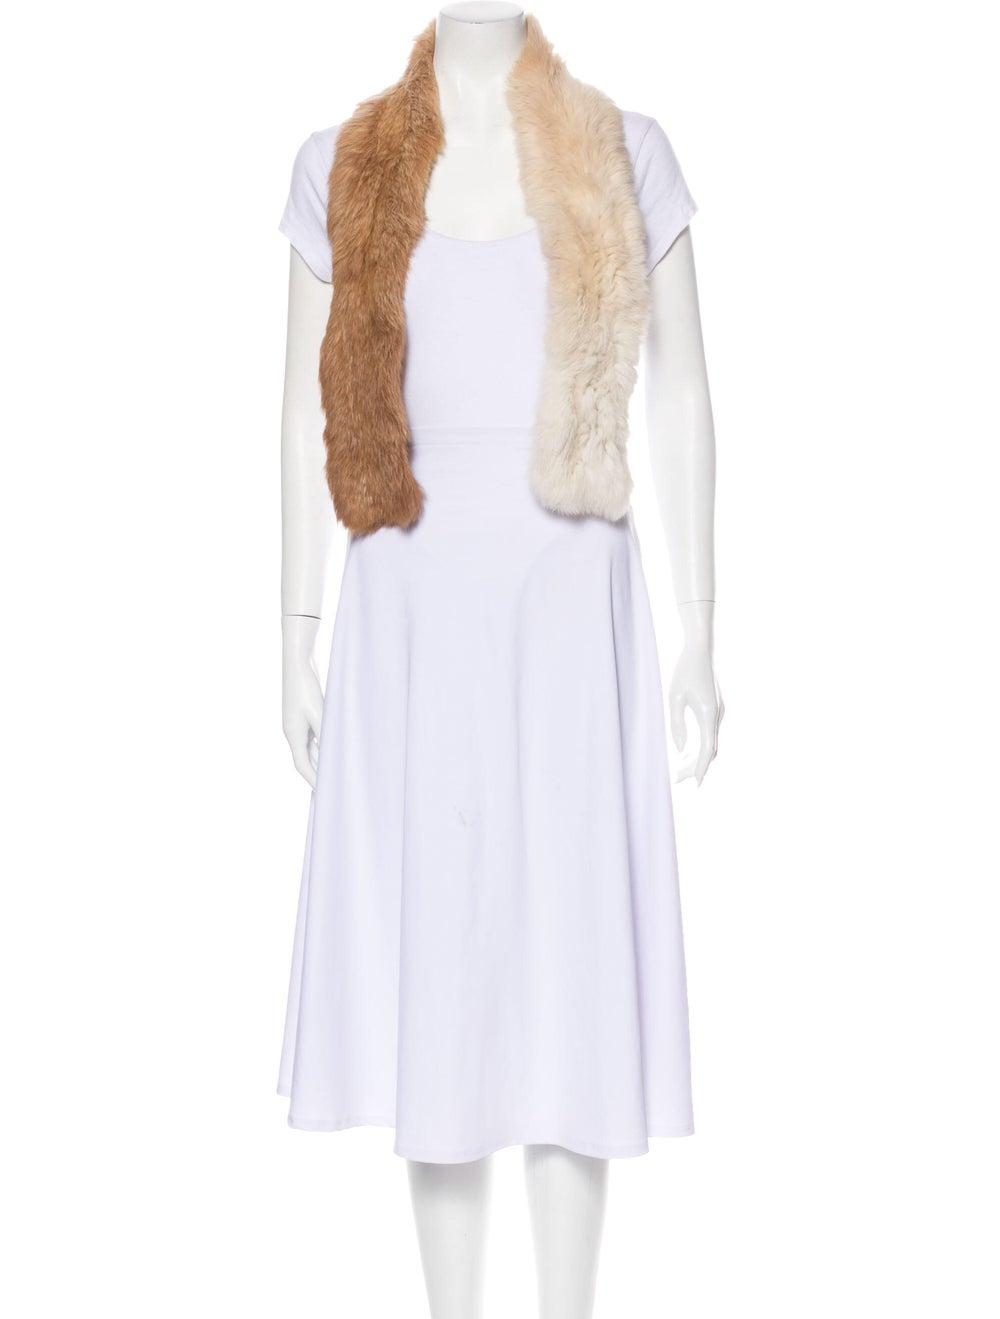 Fur Fur Stole - image 3